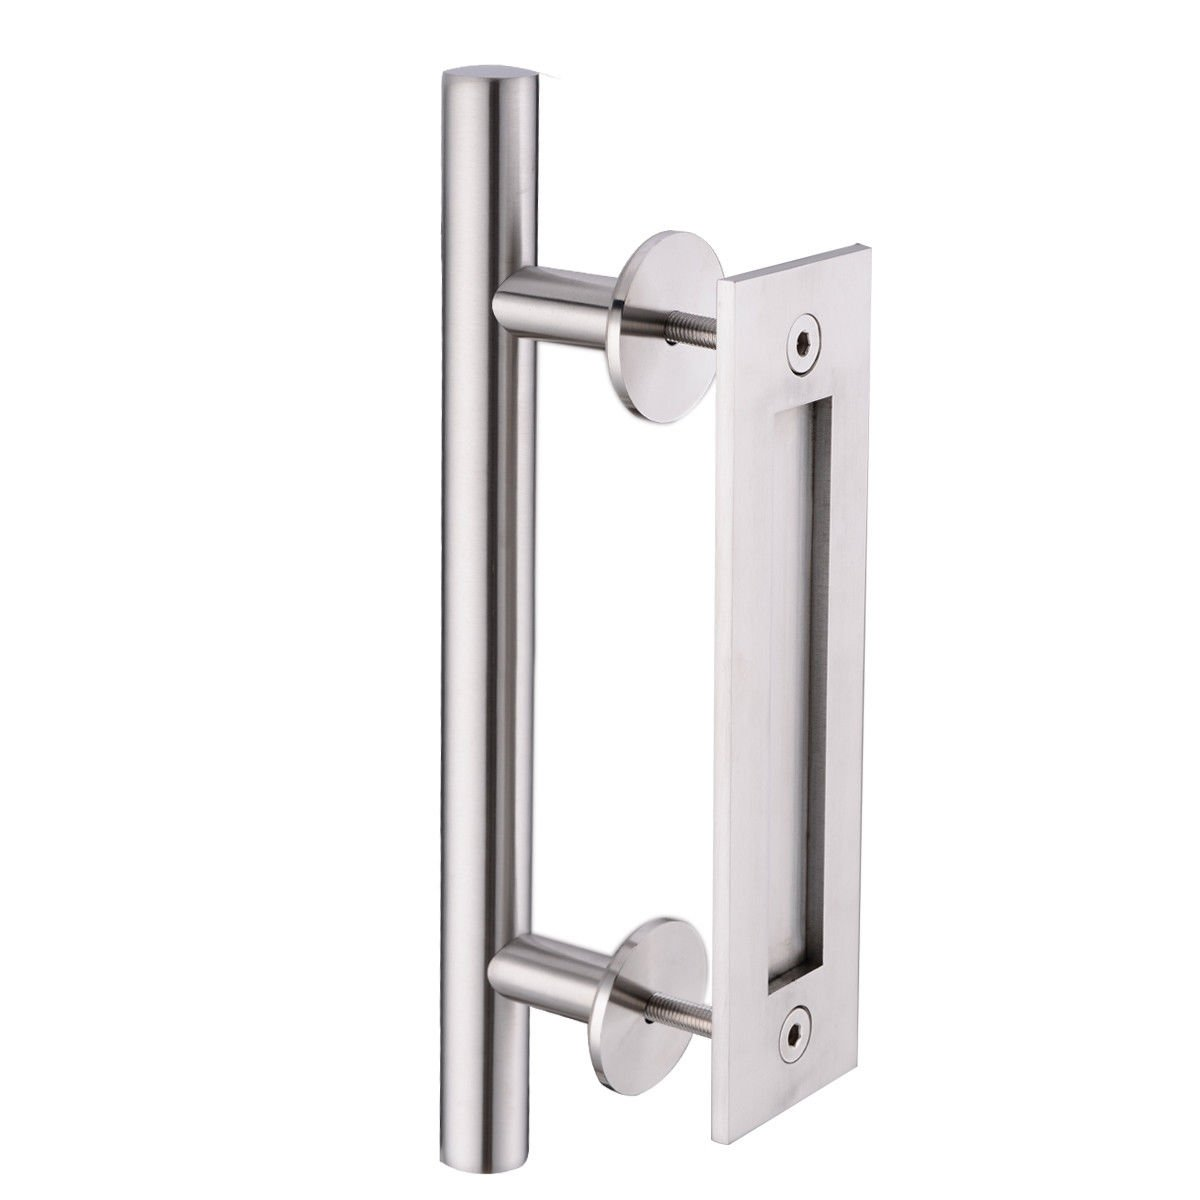 HANEBATH 304 Stainless Steel Pull and Flush Door Handle Set 12'' Sliding or Wood Barn Door with Mount Screws Included,Brushed Nickel